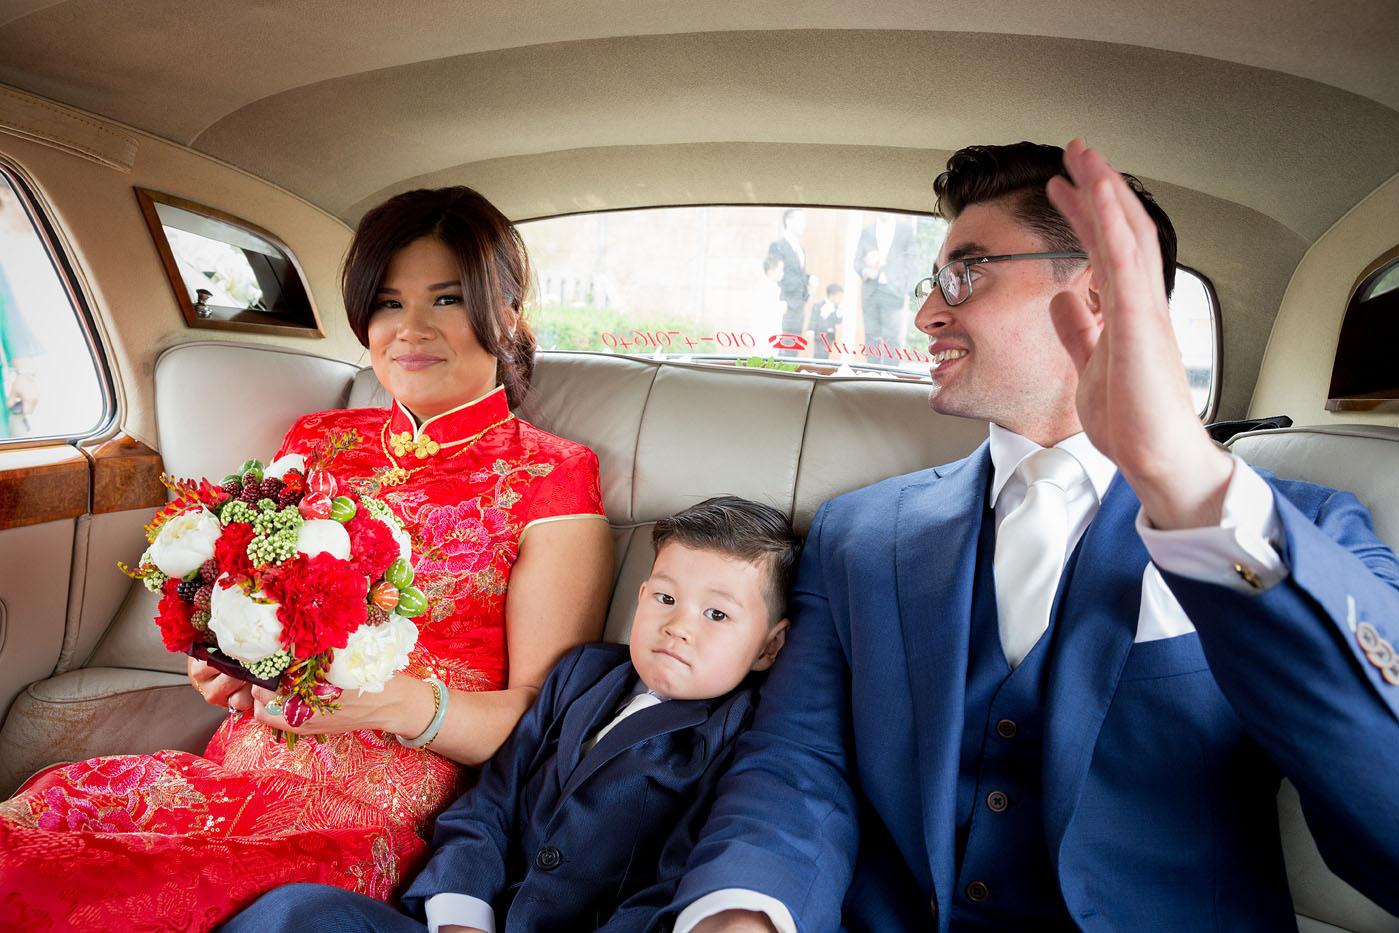 bruiloft-wedding-trouwen-fotograaf-chinees-bobhersbach-rotterdam-schiedam